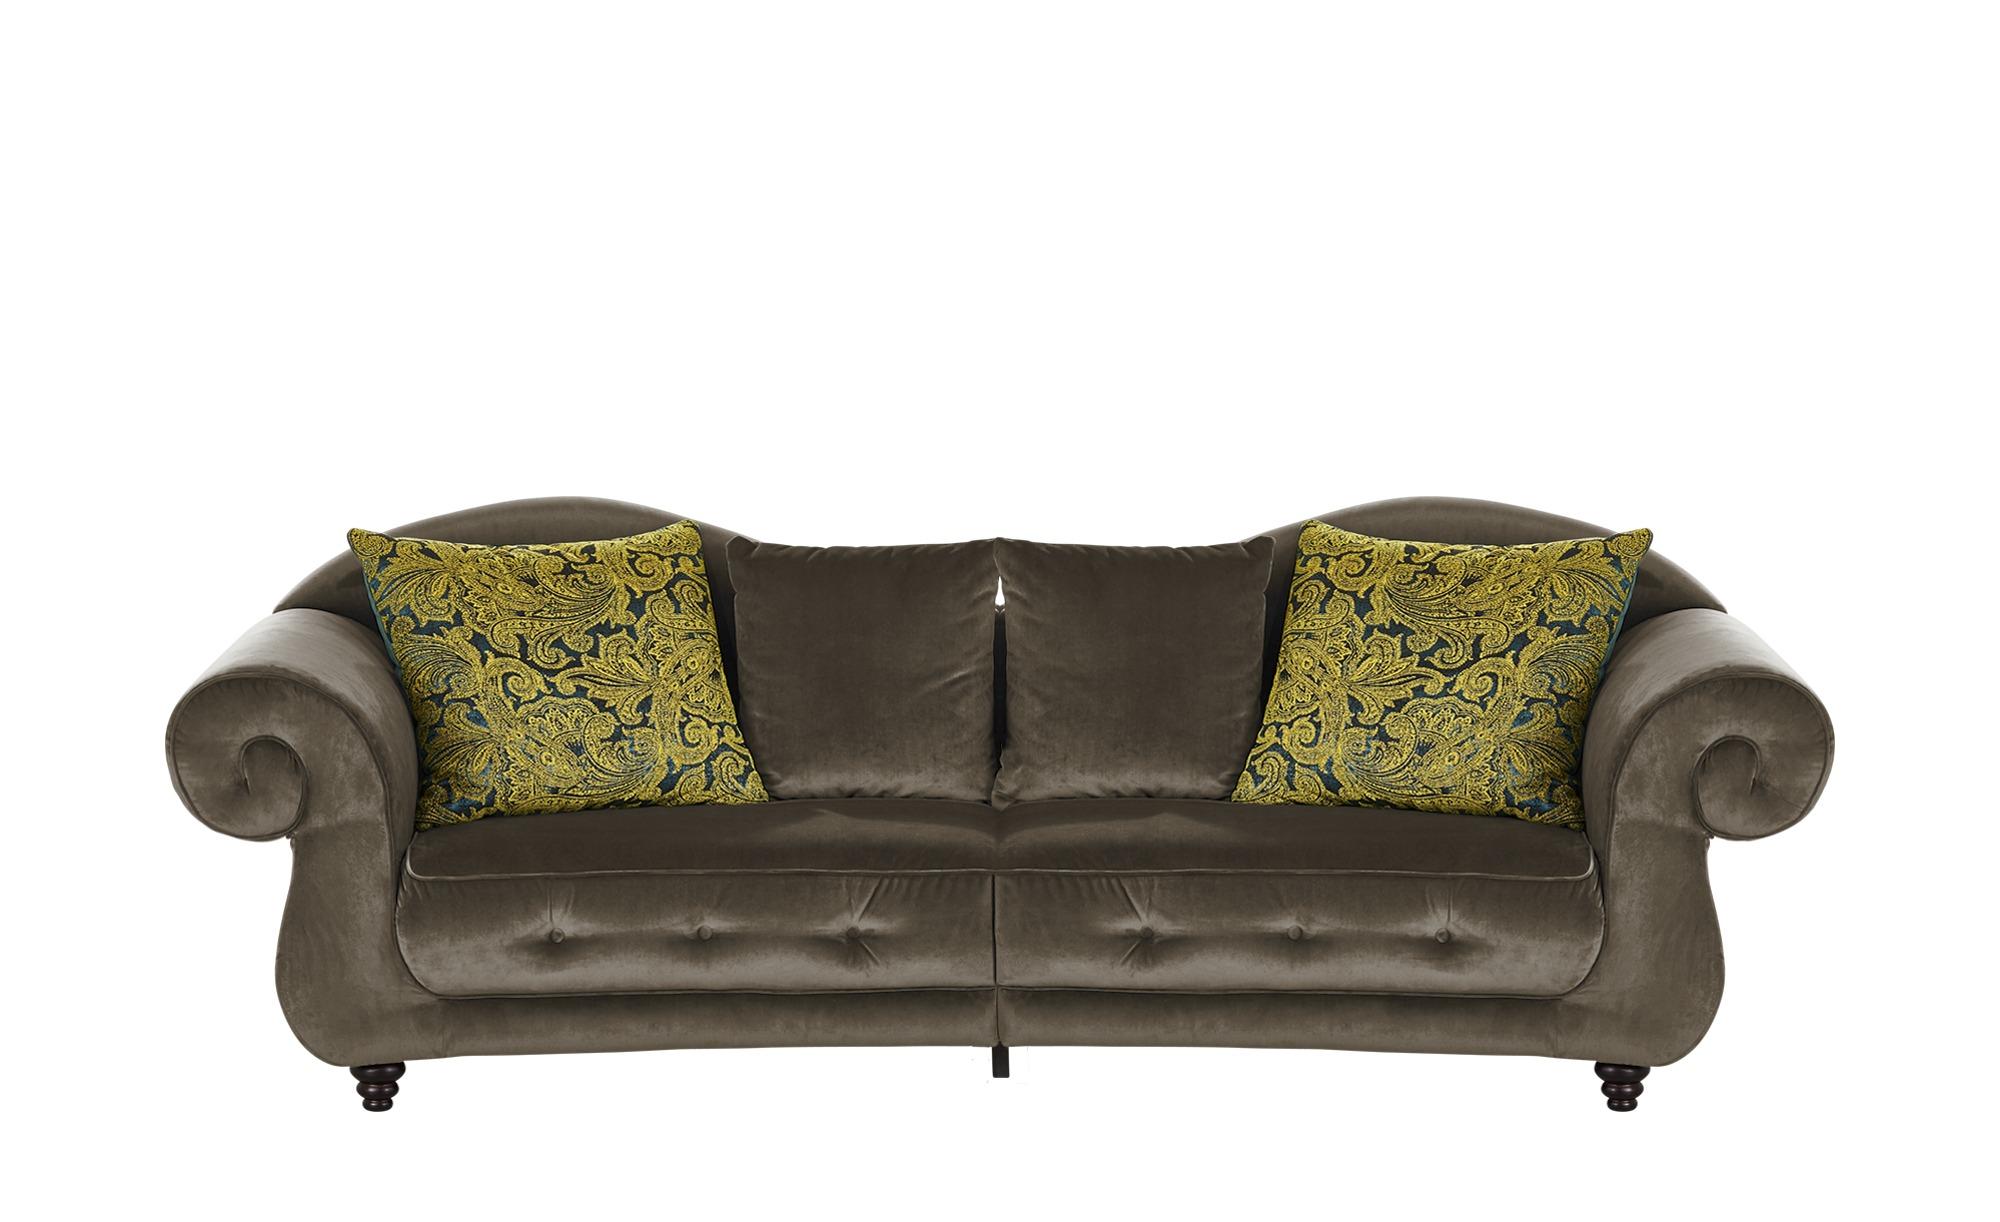 Design Big Sofa braun - Mikrofaser Nobody ¦ braun ¦ Maße (cm): B: 288 H: 98 T: 110 Polstermöbel > Sofas > Big-Sofas - Höffner